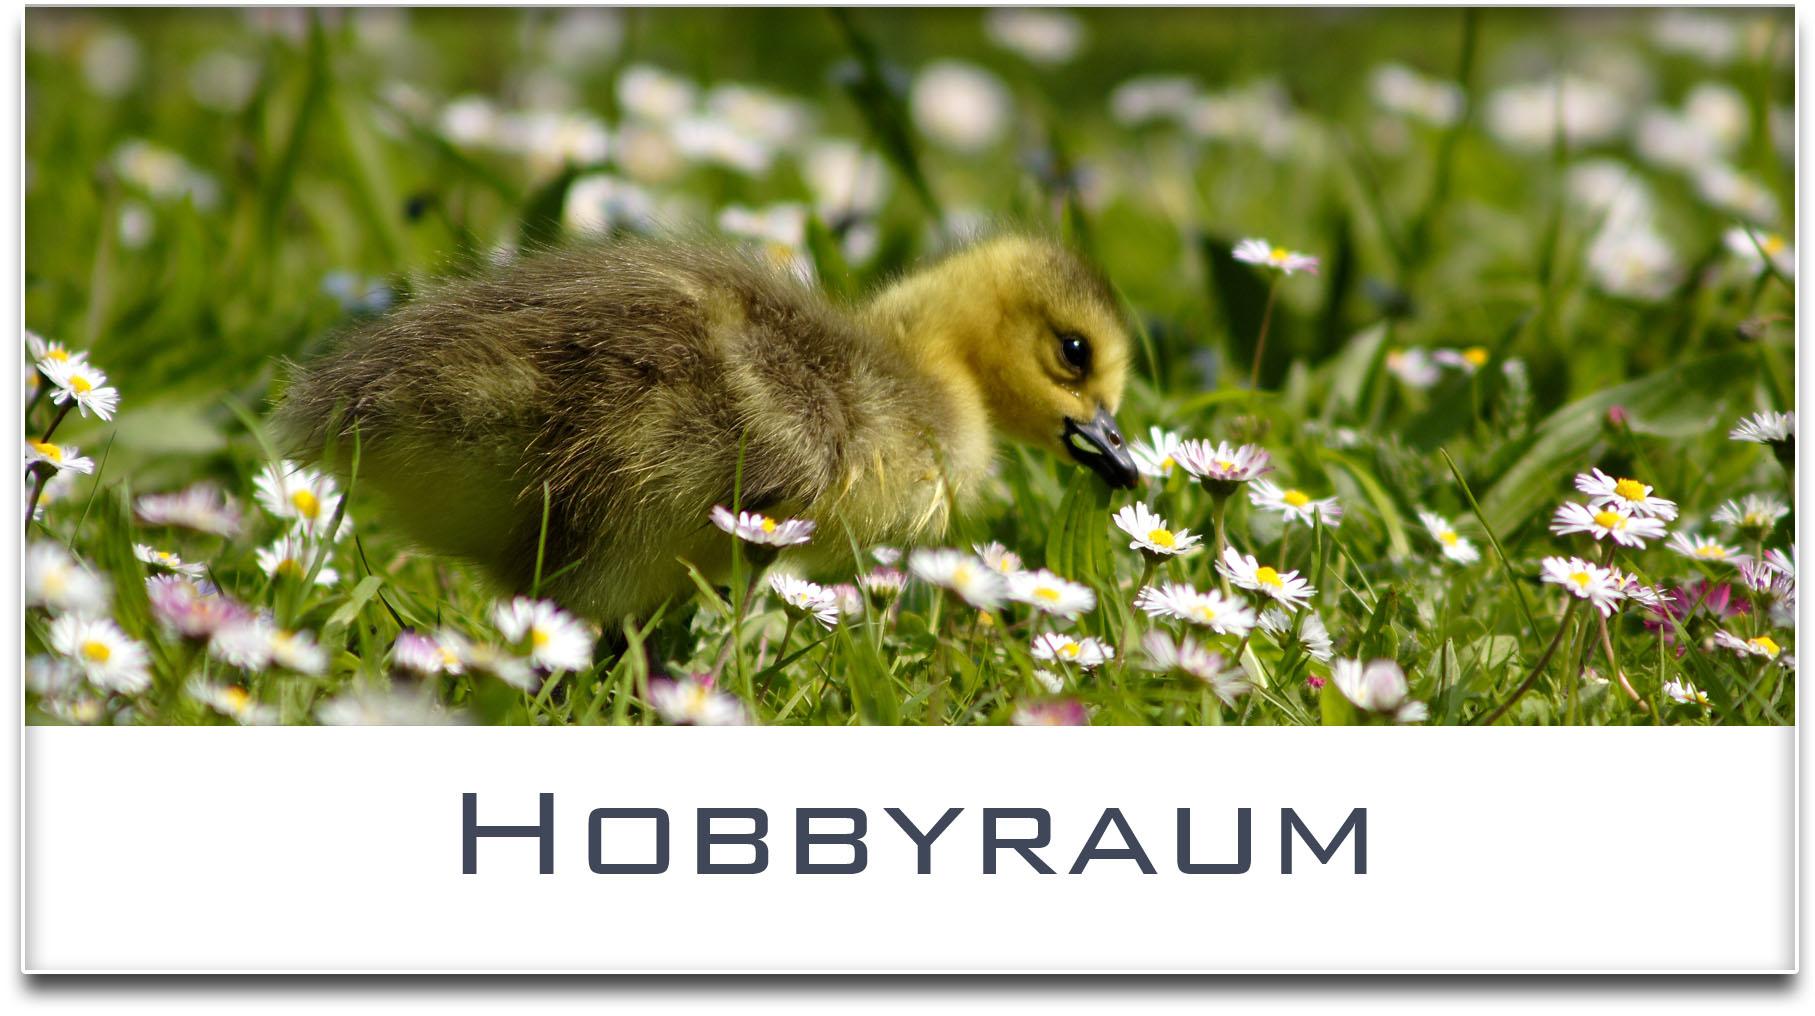 Türschild / Haustürschild / Entenküken / Hobbyraum / Selbstklebend